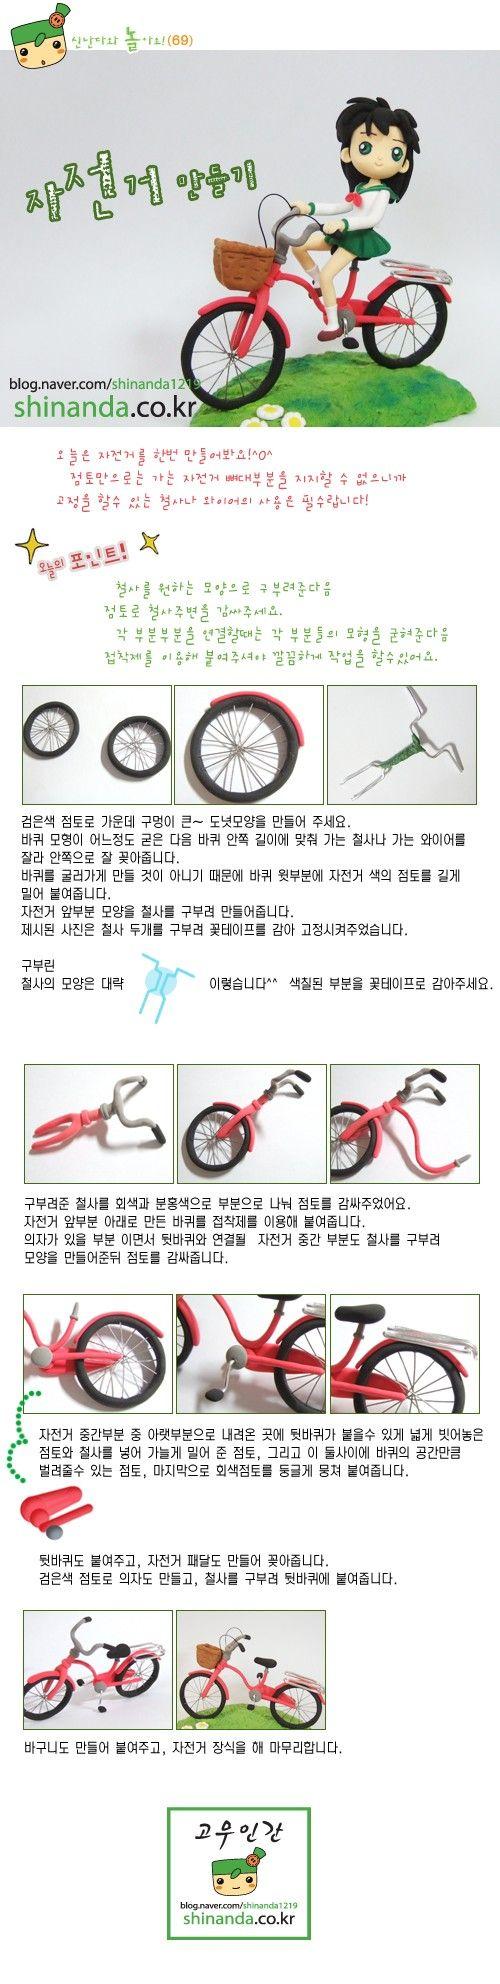 Bicycle - 黏土 纸粘土 创意泥 软陶 手工